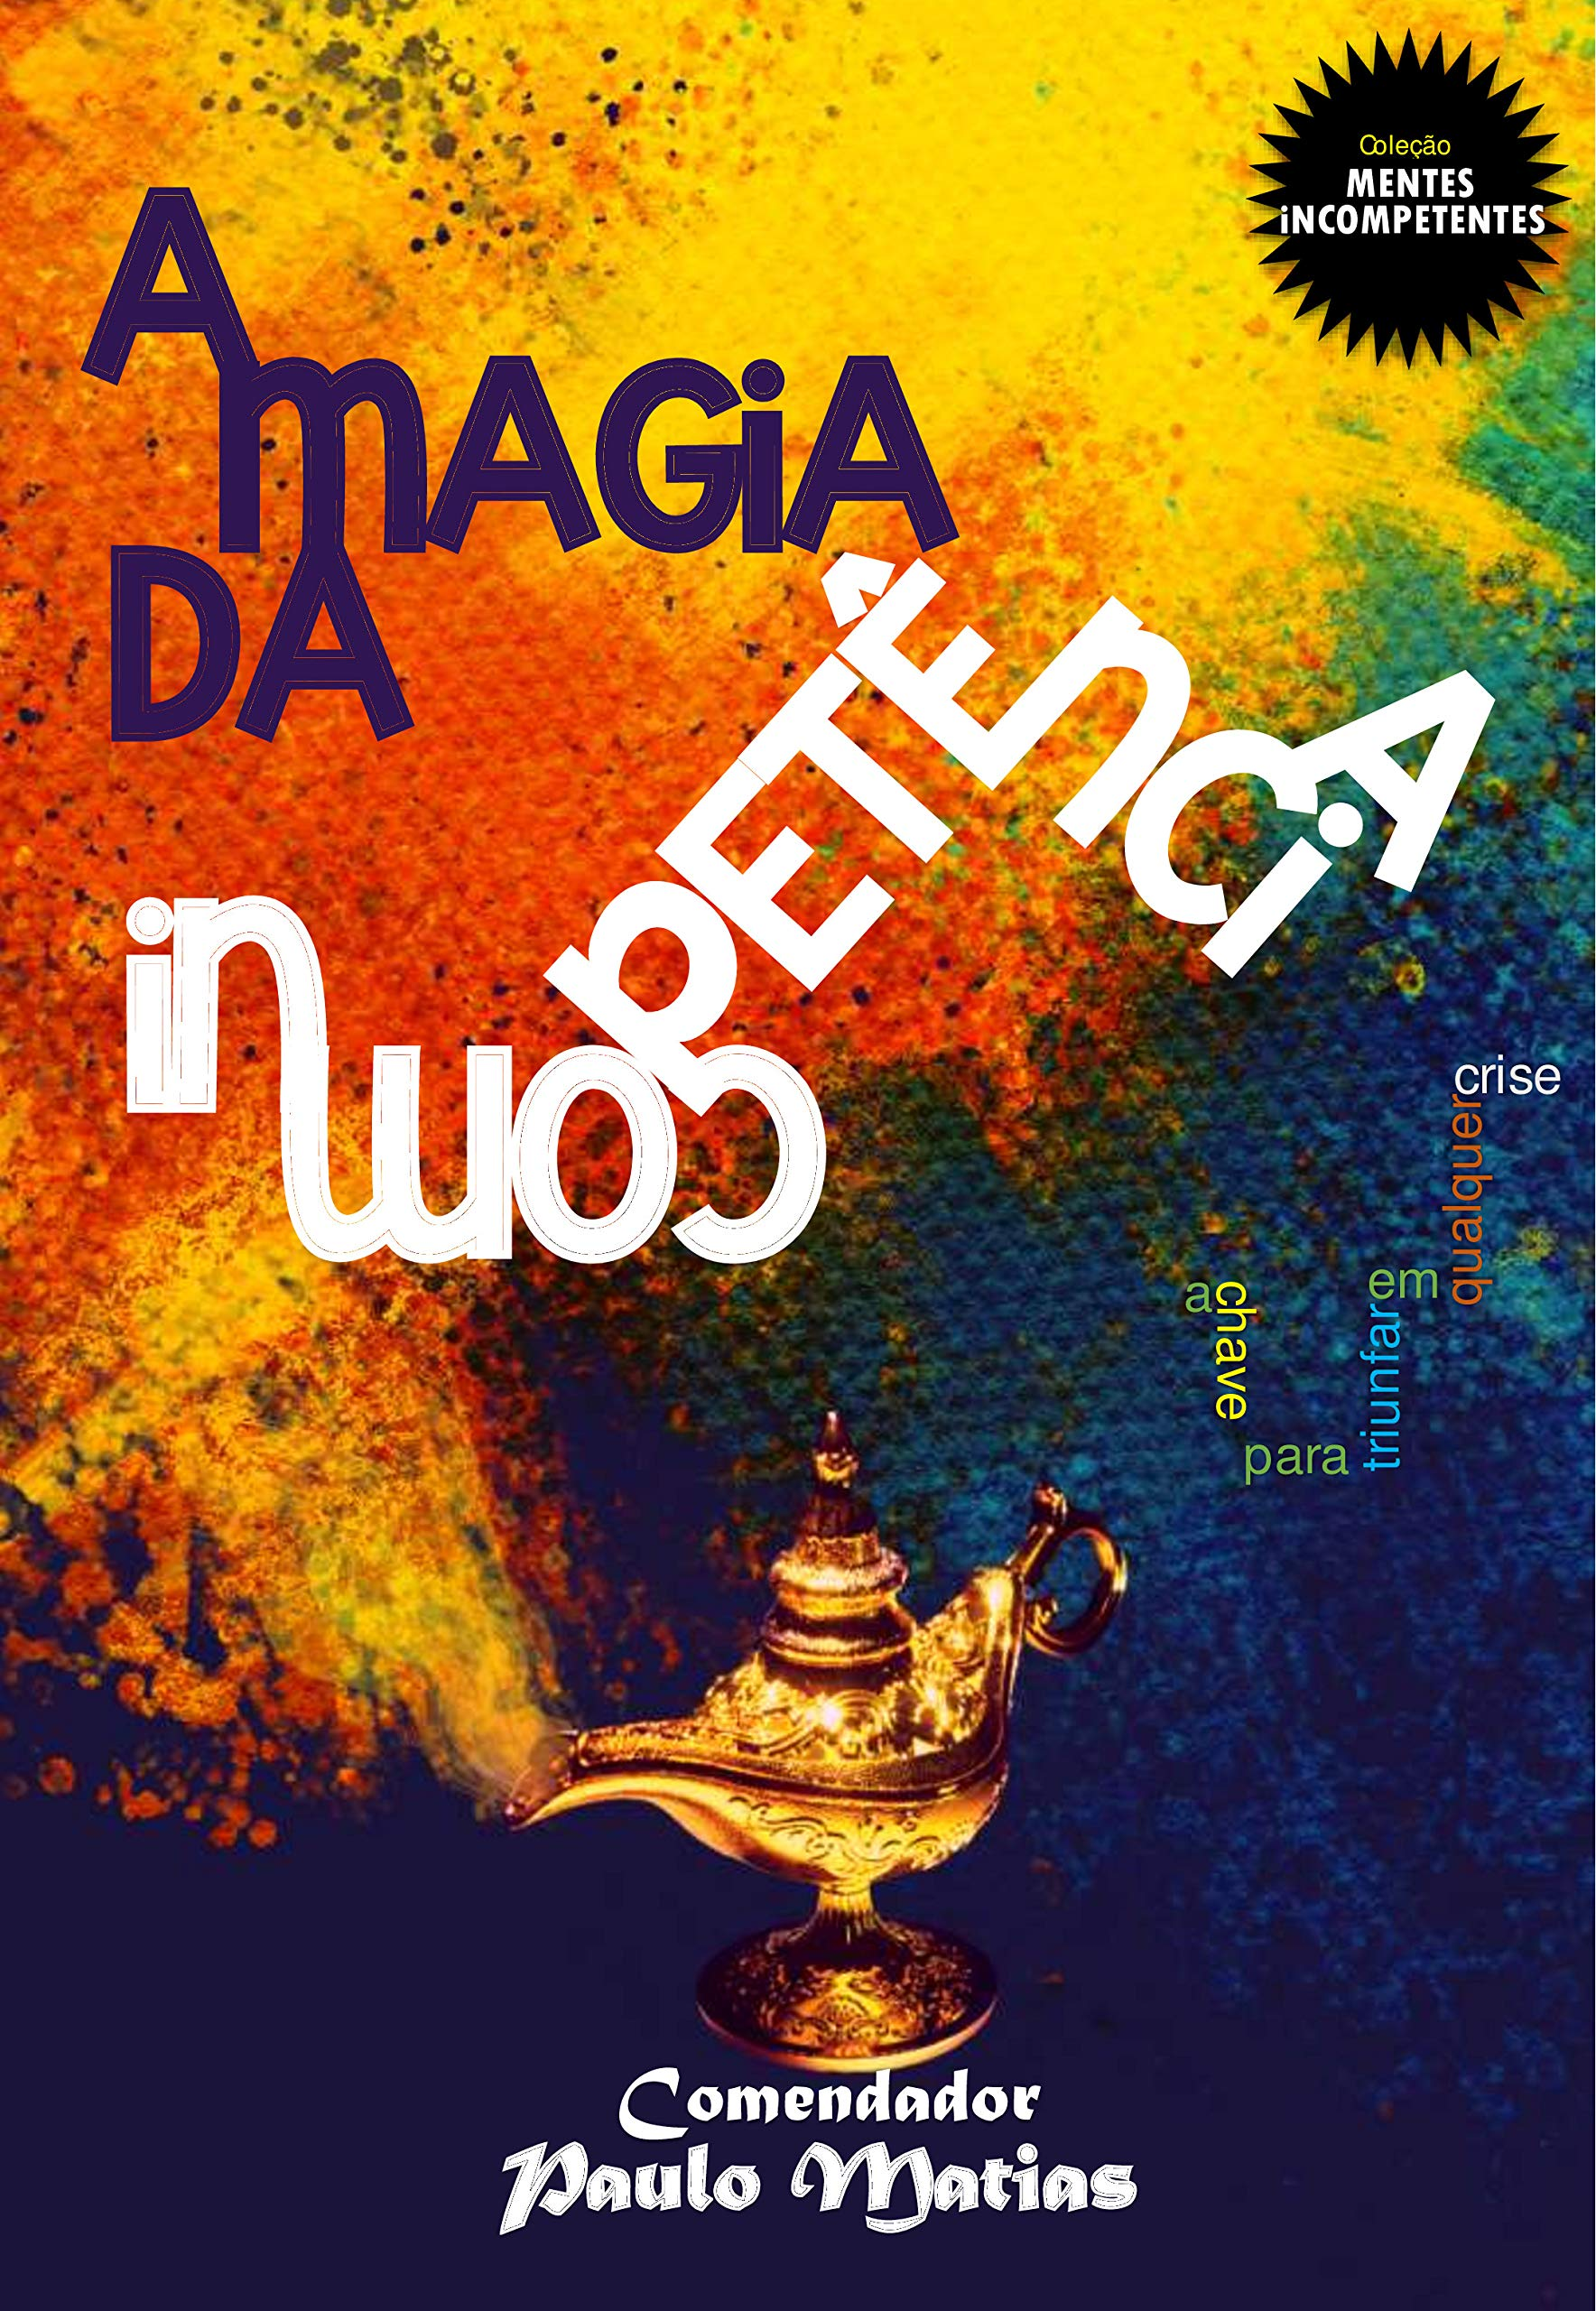 A Magia da Incompetência: A chave para triunfar em qualquer crise! (Portuguese Edition)